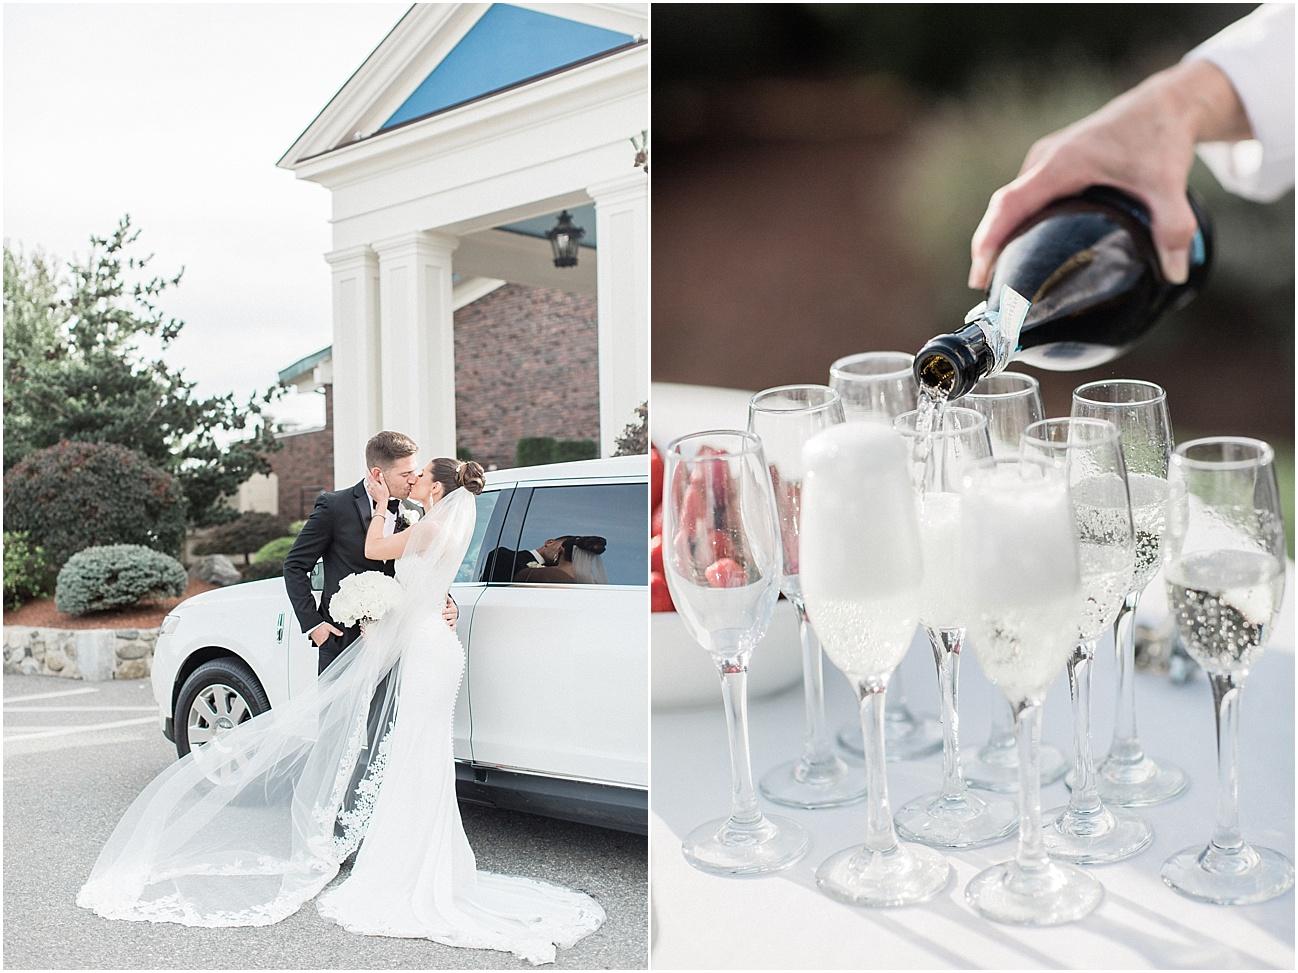 bianca_chris_danversport_italian_blush_gold_north_shore_cape_cod_boston_wedding_photographer_meredith_jane_photography_photo_1121.jpg